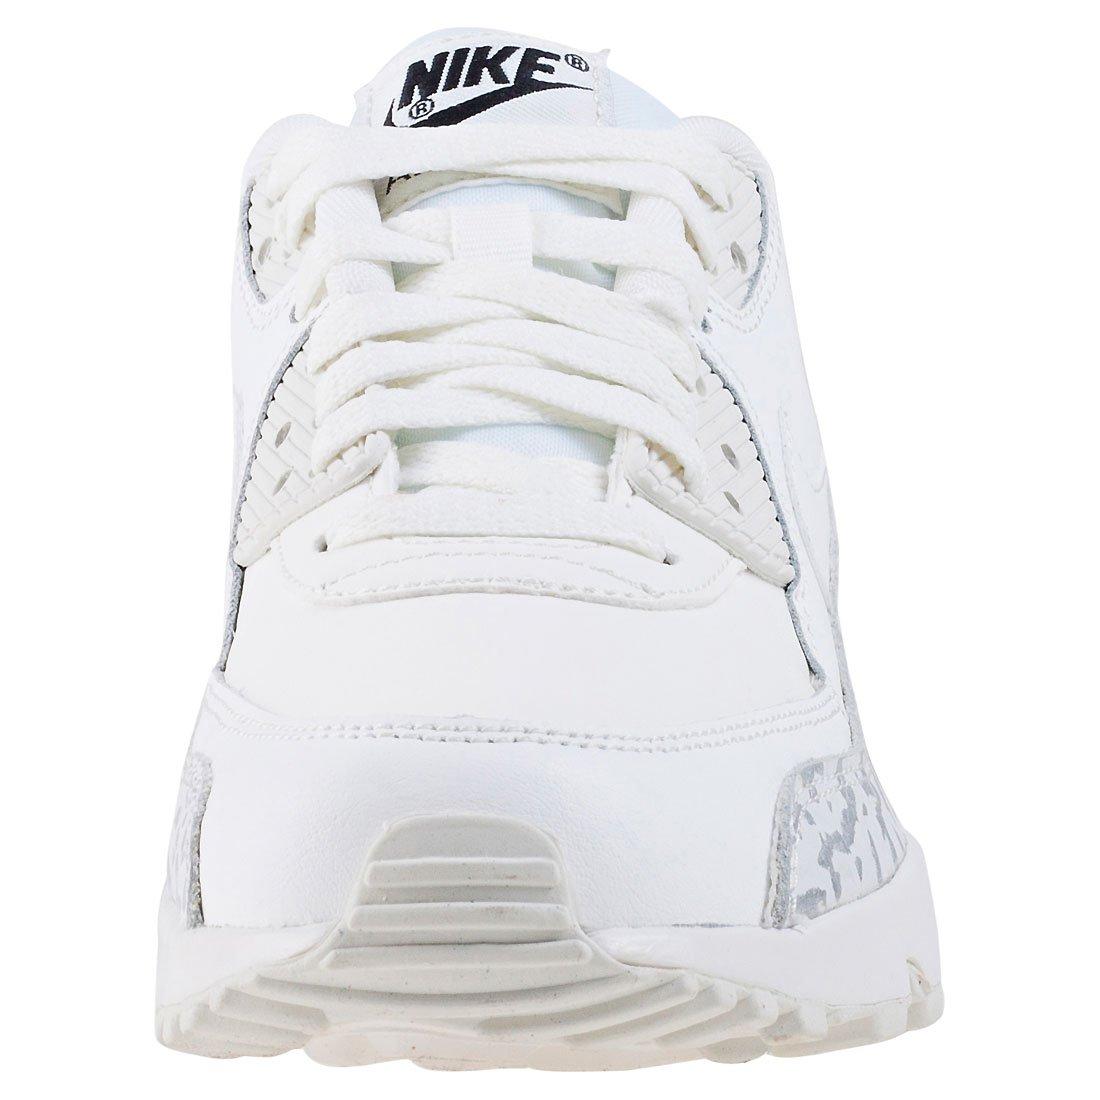 Nike Air Max 90 Ltr Se GG 897987 100 | Beige, Cremefarben